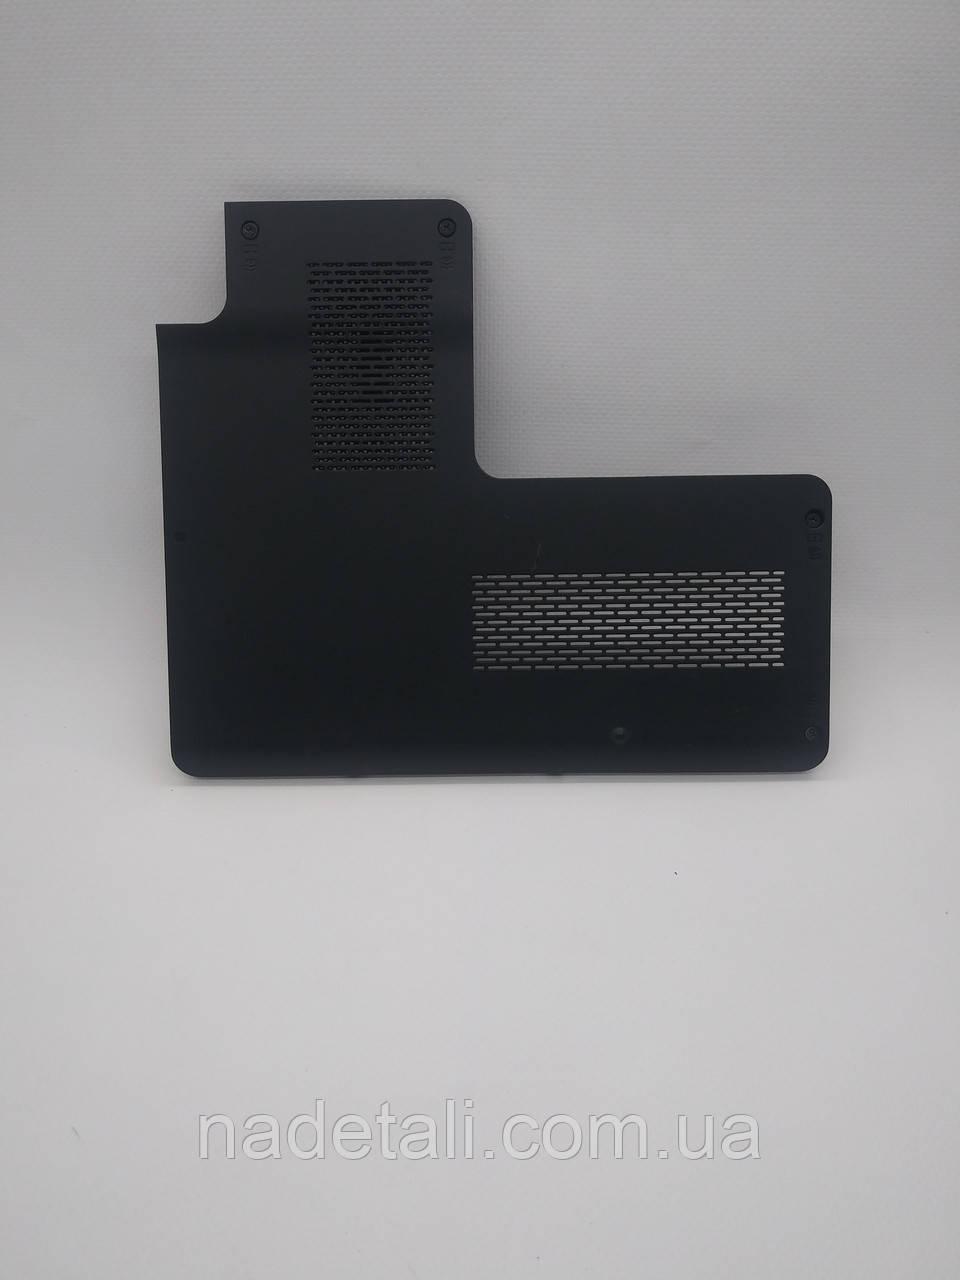 Сервисная крышка Compaq Presario CQ61 380P6HDTP00